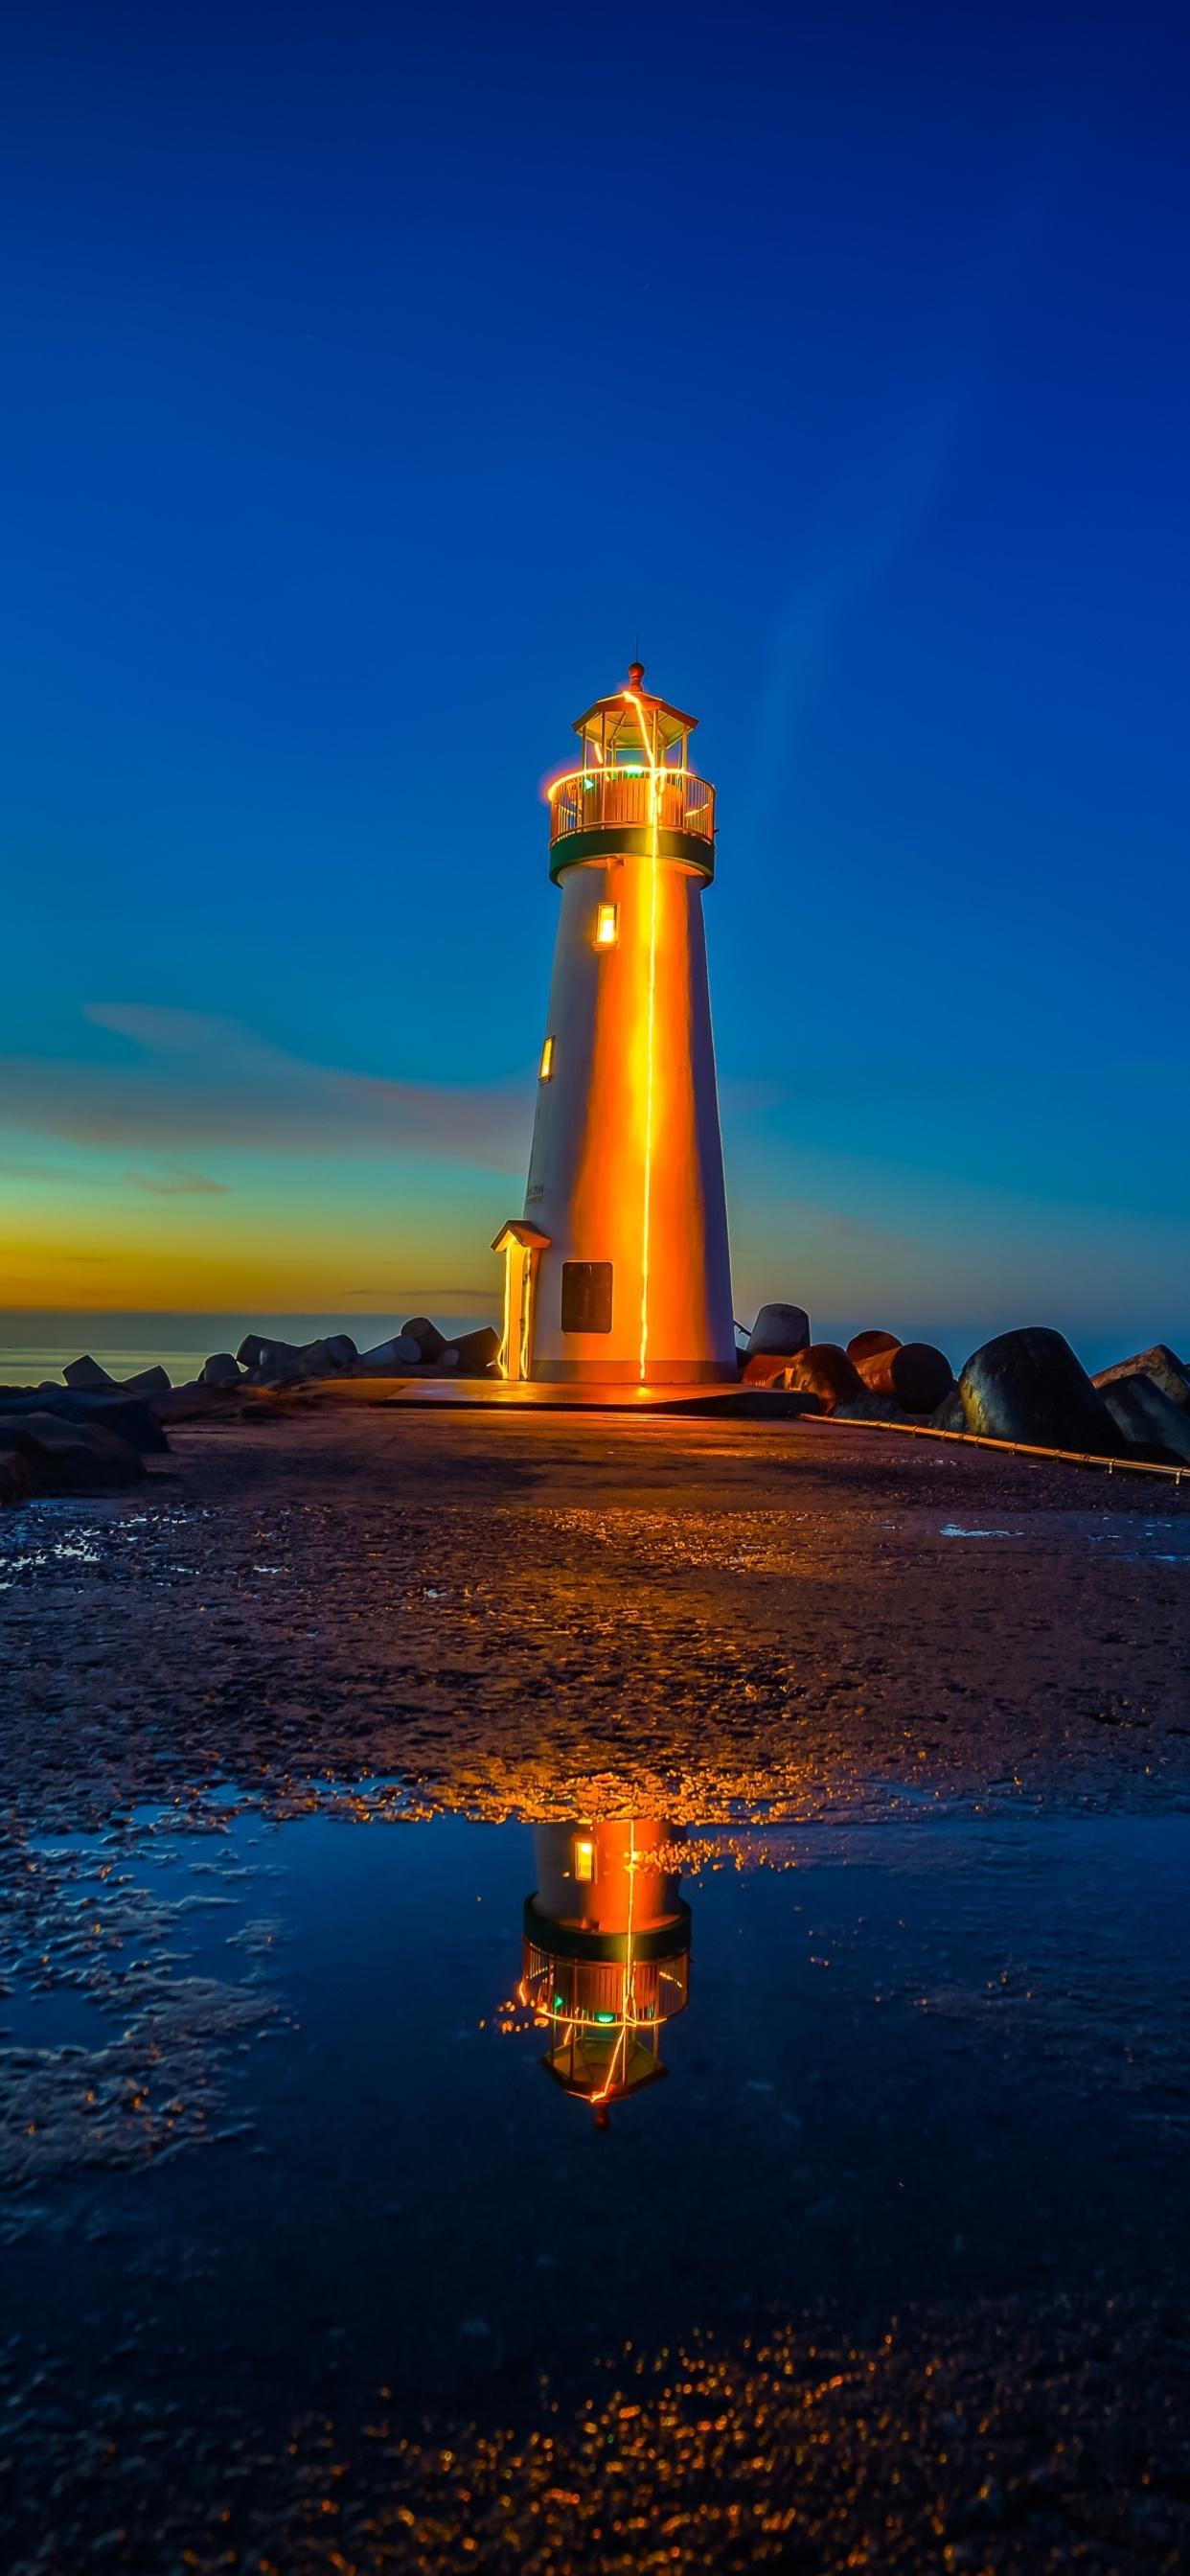 lighthouses-sunrises-and-sunsets-usa-monterey-bay-4k-u3.jpg